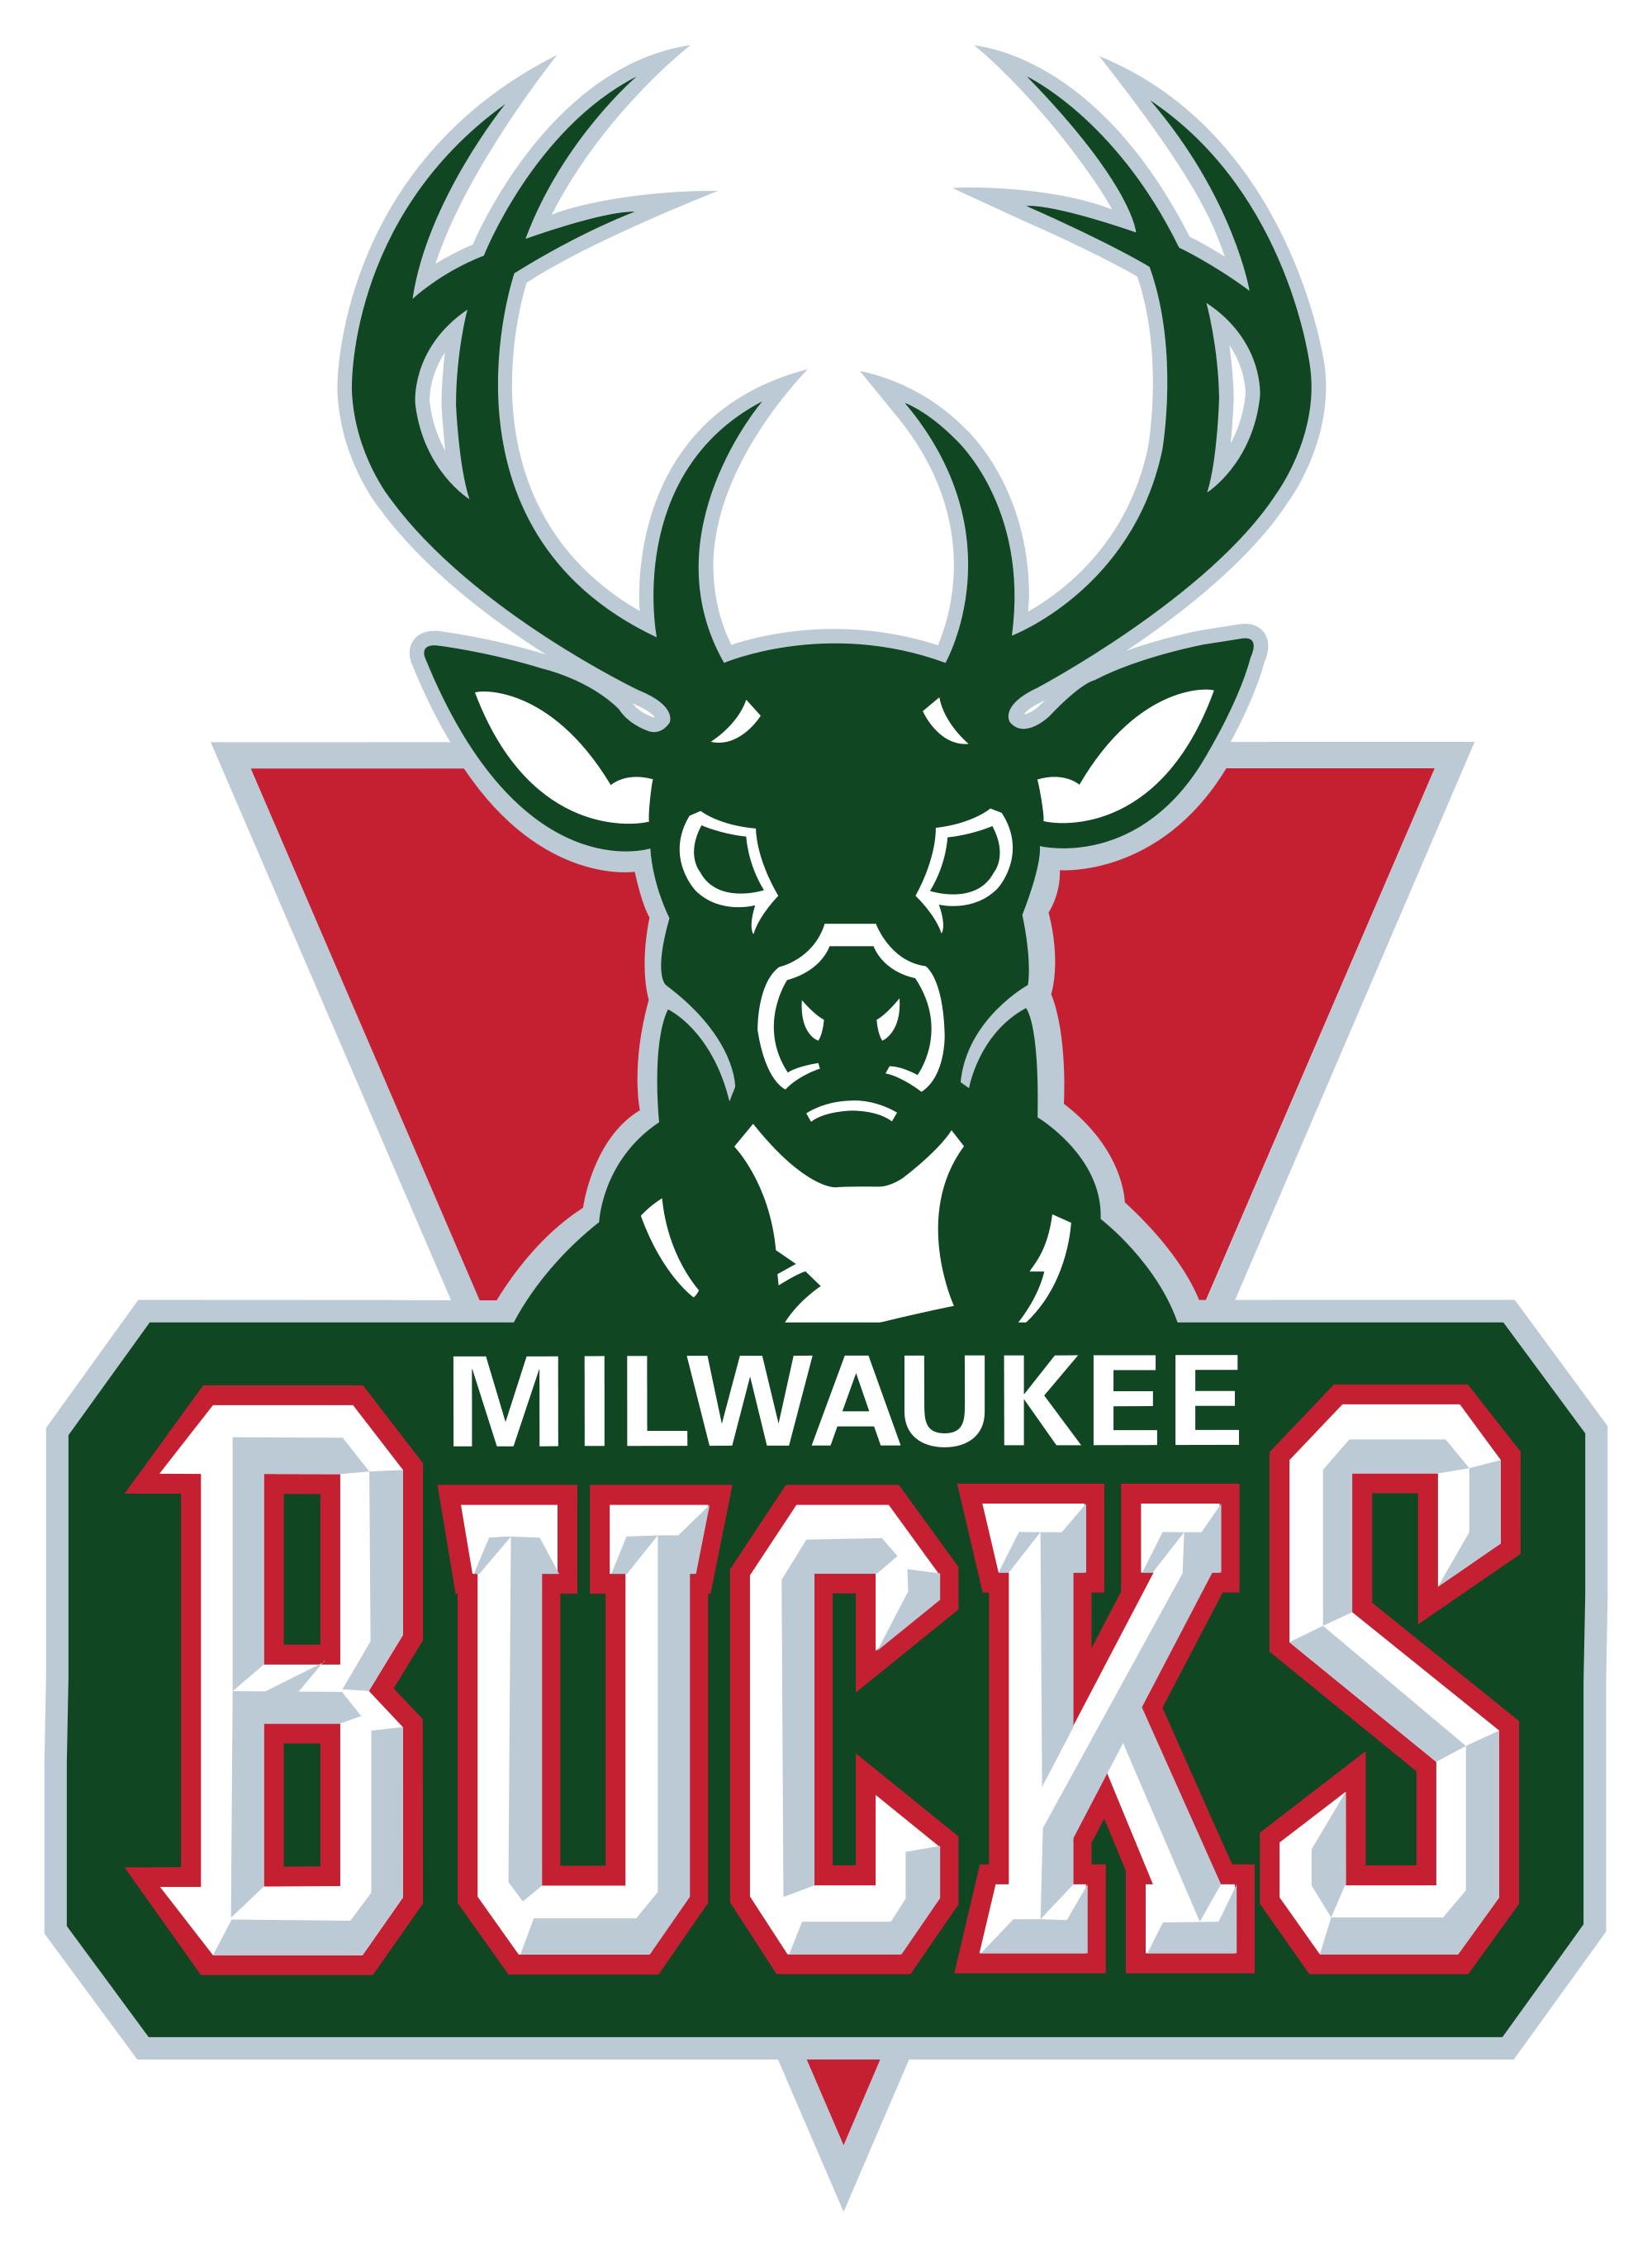 dd324fba4ab4 Milwaukee Bucks logo. Milwaukee Bucks logo Escudo Deportivo